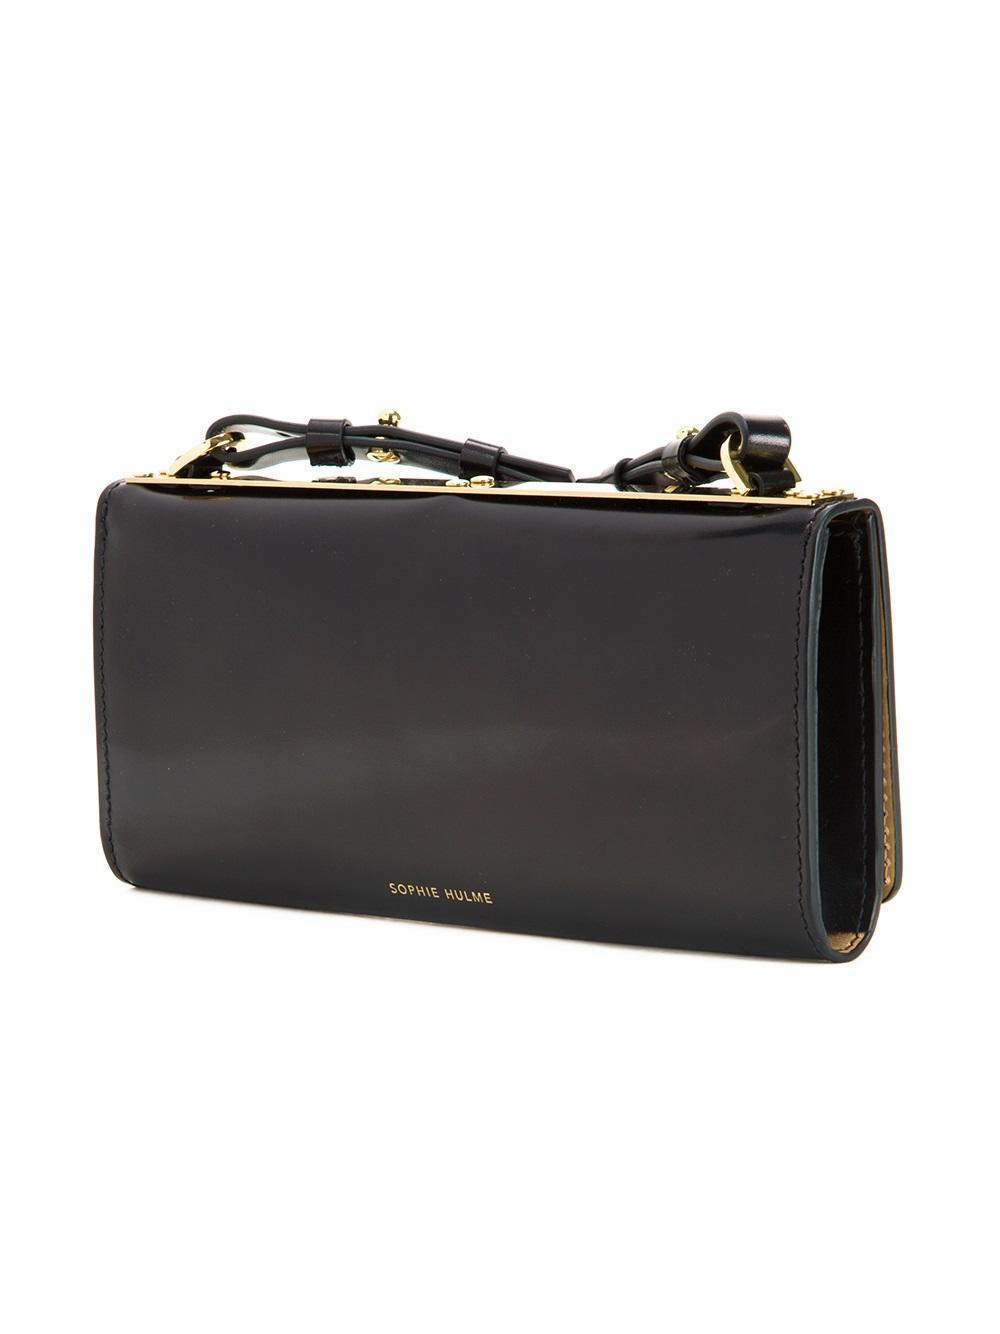 Sophie Hulme Leather Studded Crossbody Bag in Black